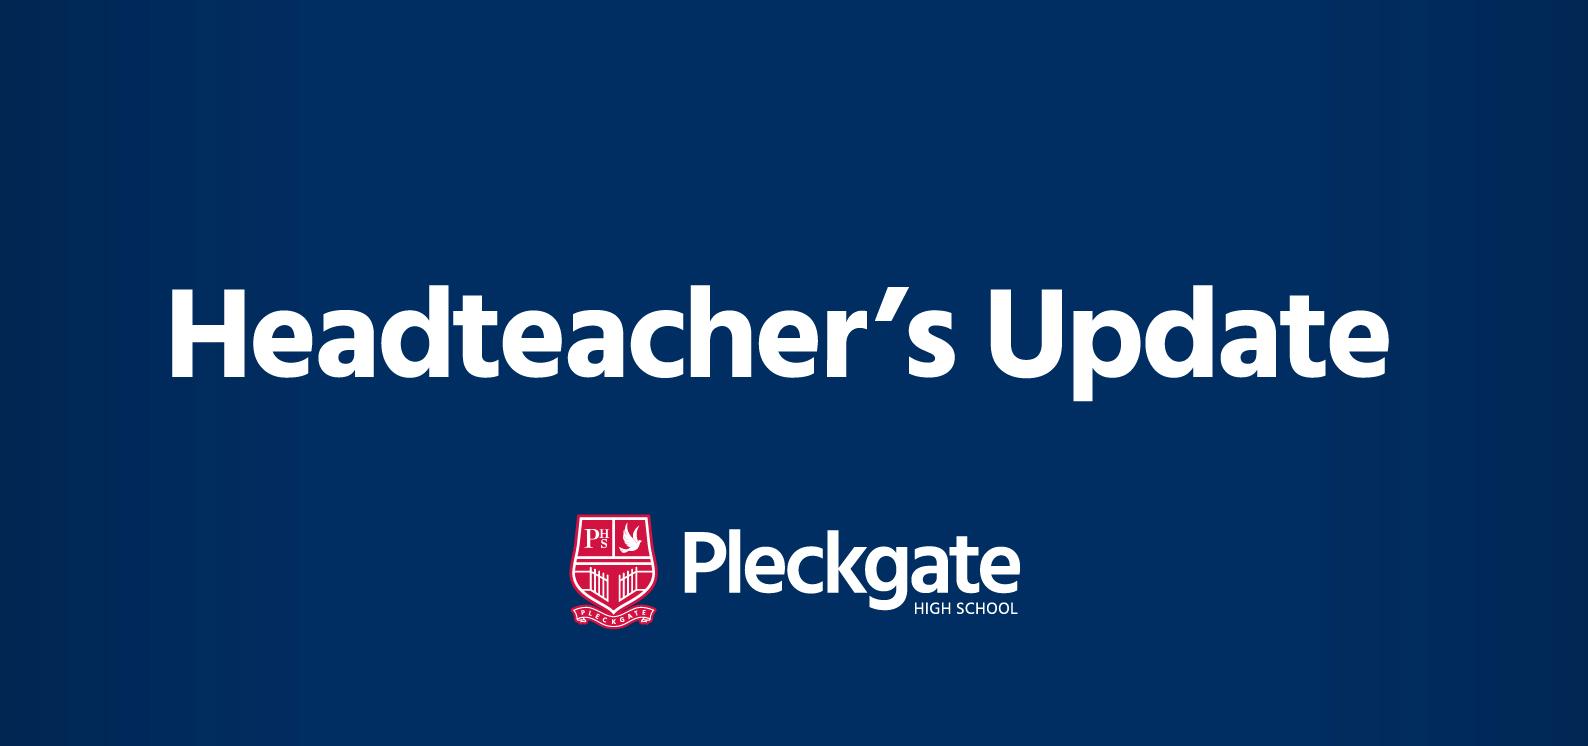 Headteacher's Update – June 2017